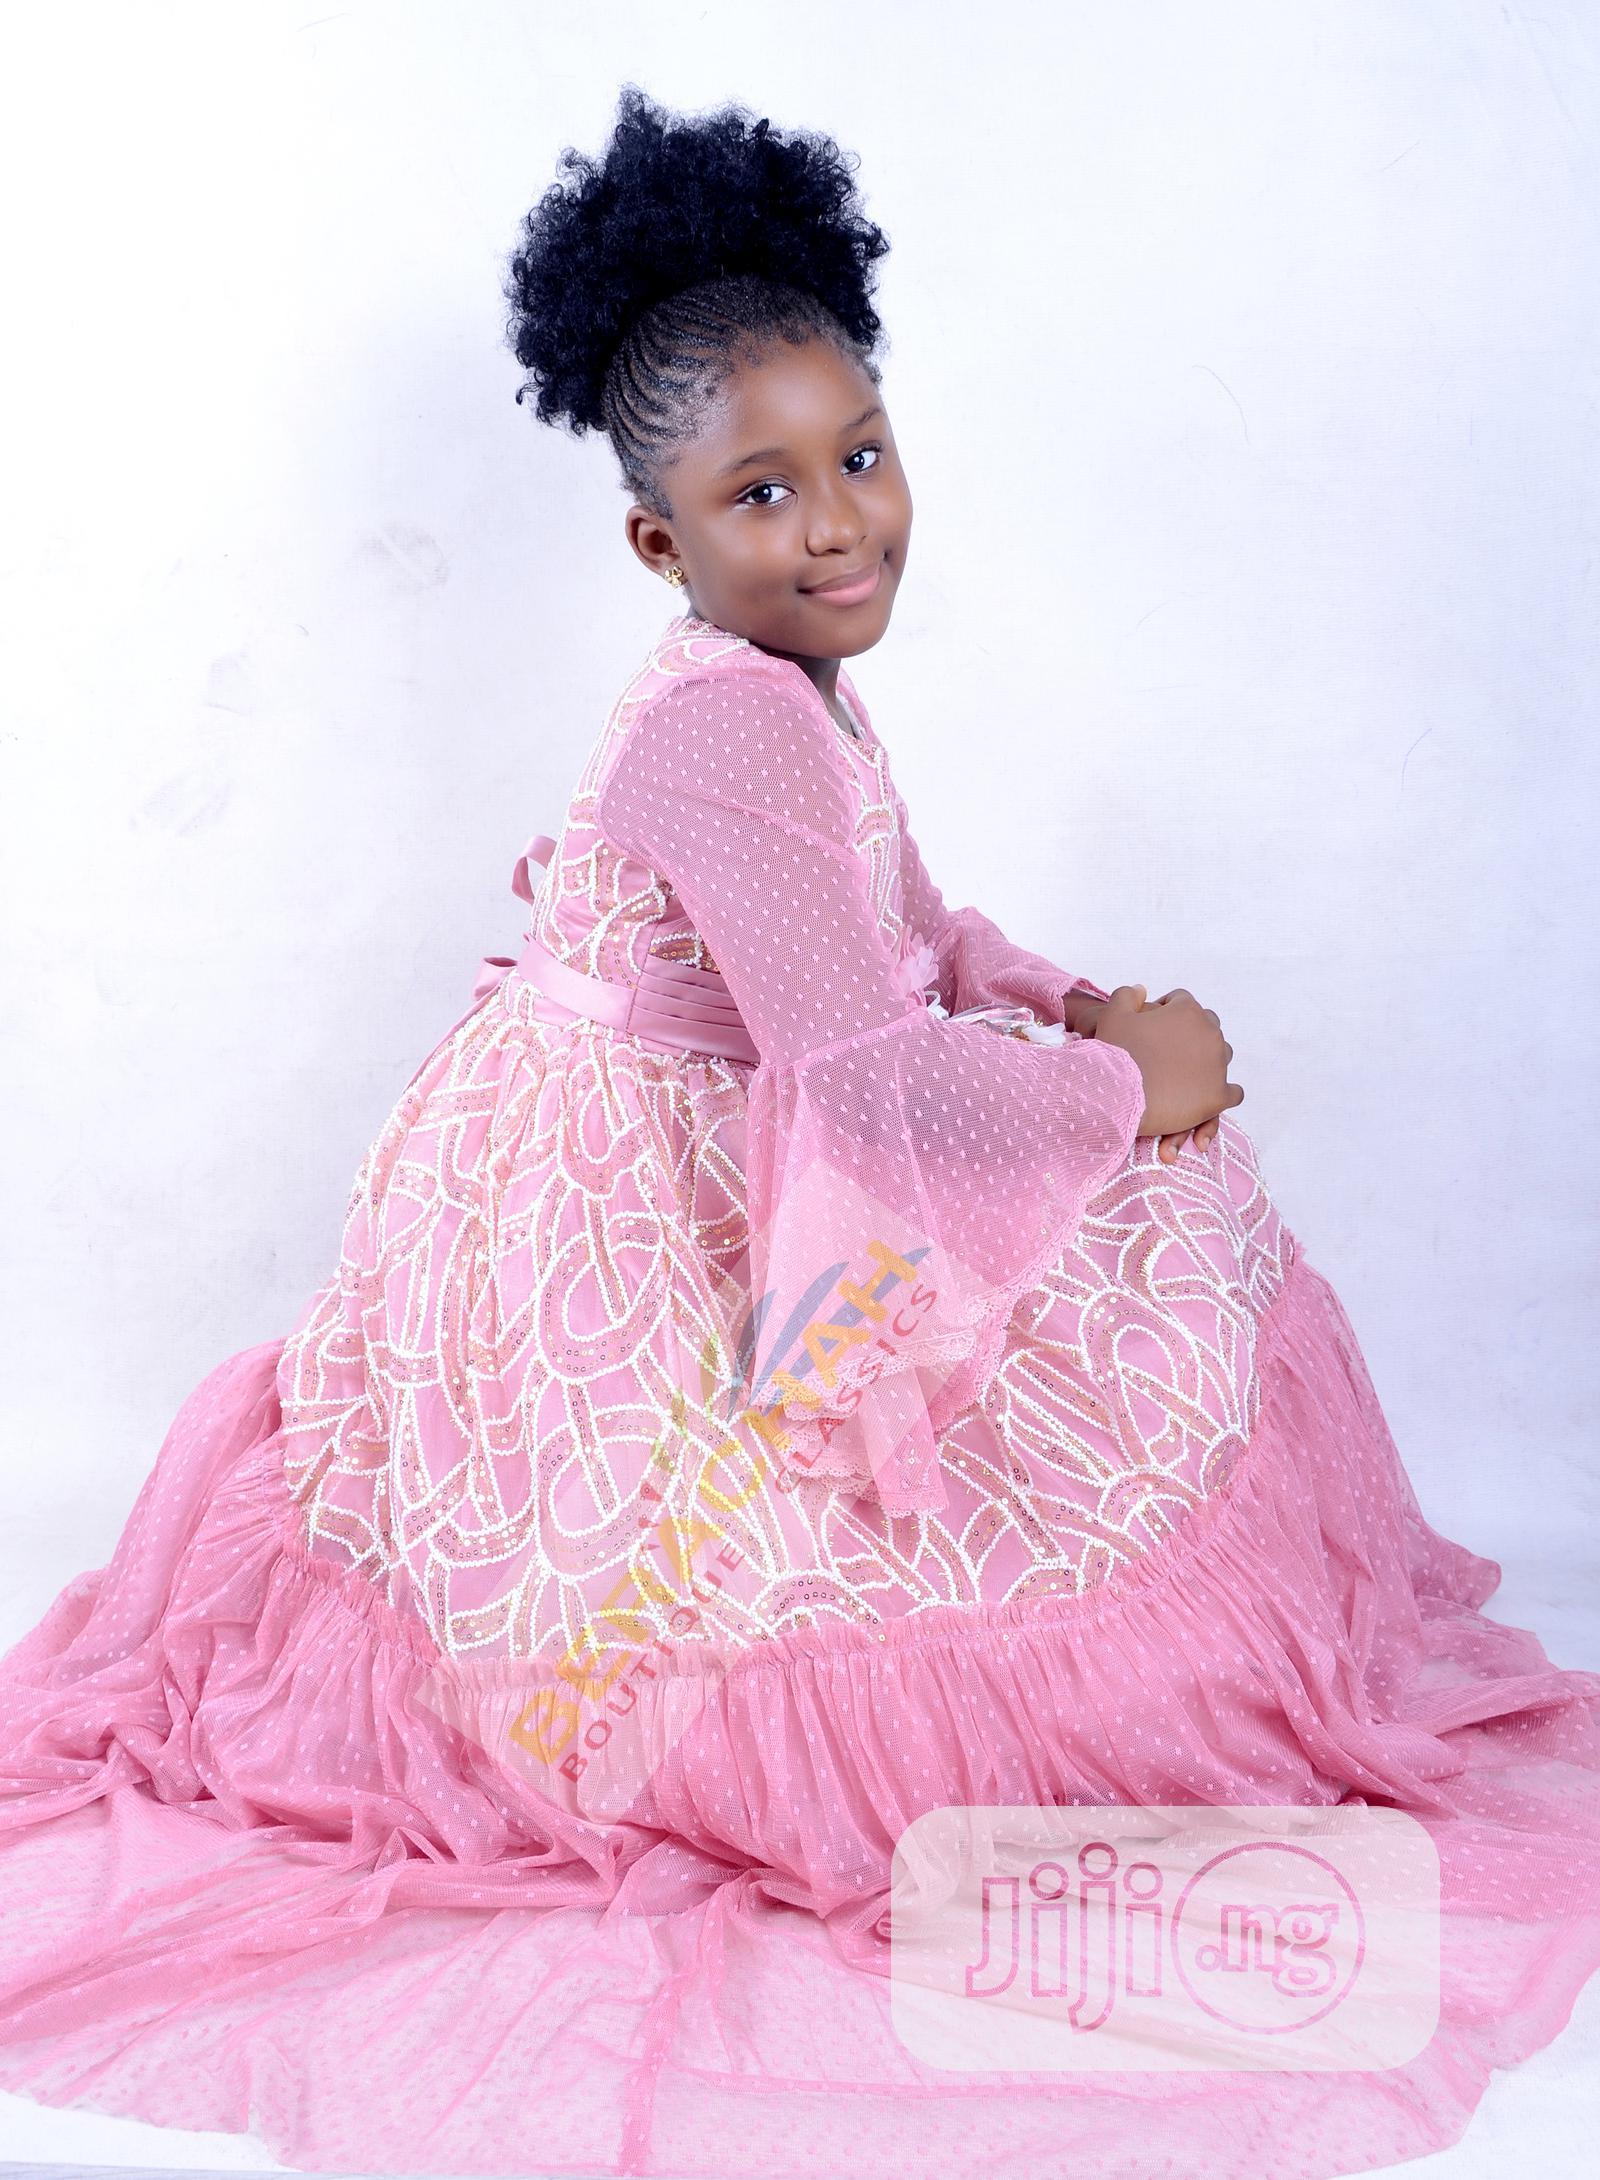 Made in Turkey Girls Ball Dress | Children's Clothing for sale in Gwarinpa, Abuja (FCT) State, Nigeria